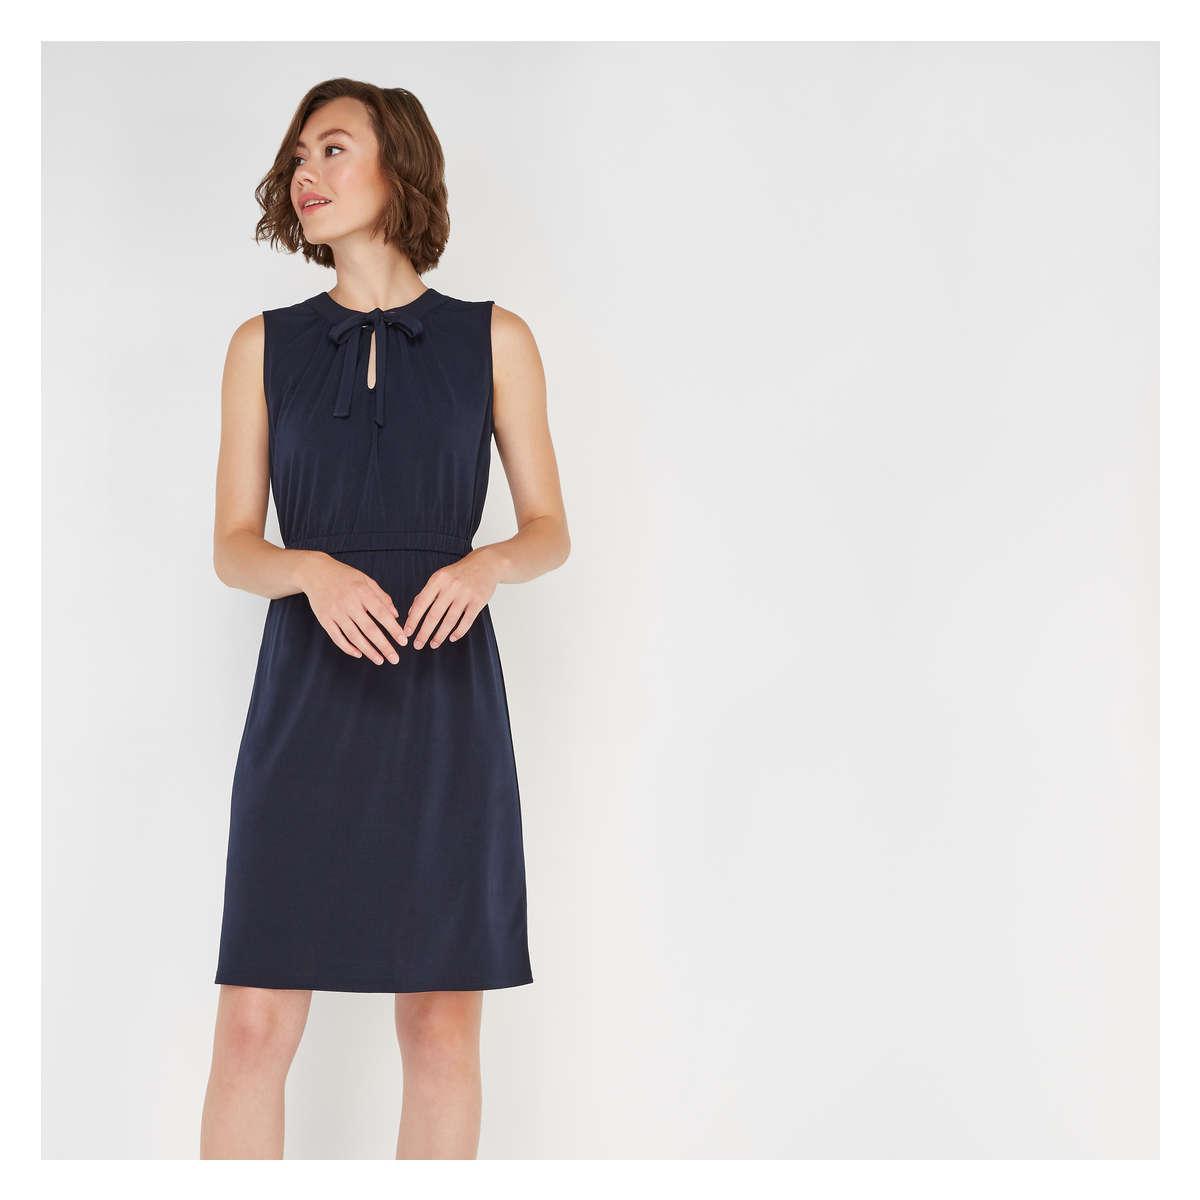 Lyst - Joe Fresh Sleeveless Grommet Dress in Blue b7a3e89a5